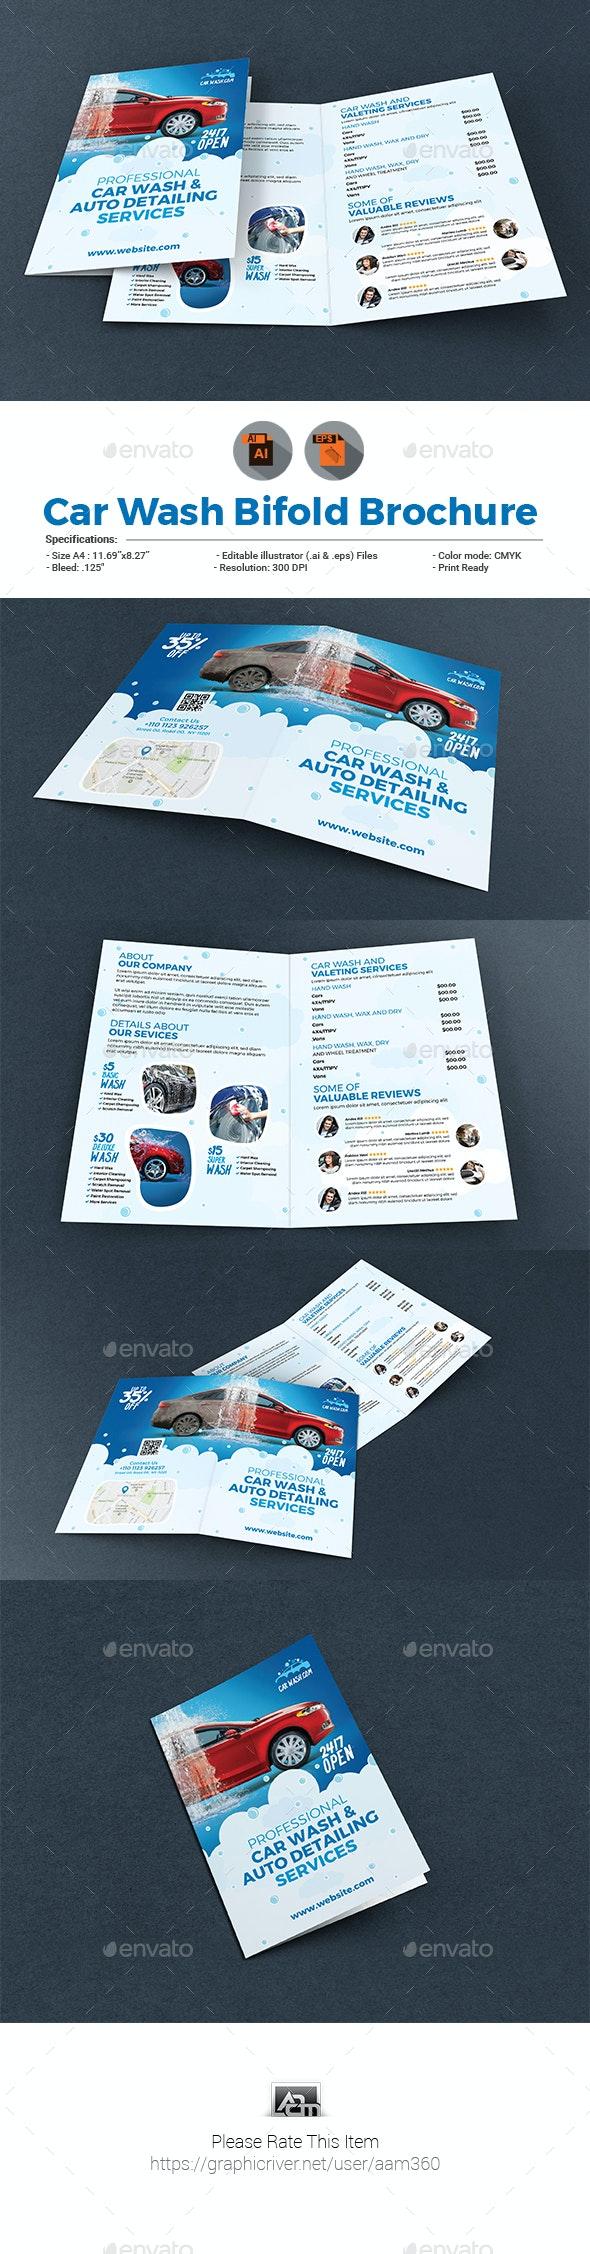 Car Wash Bifold Brochure - Informational Brochures